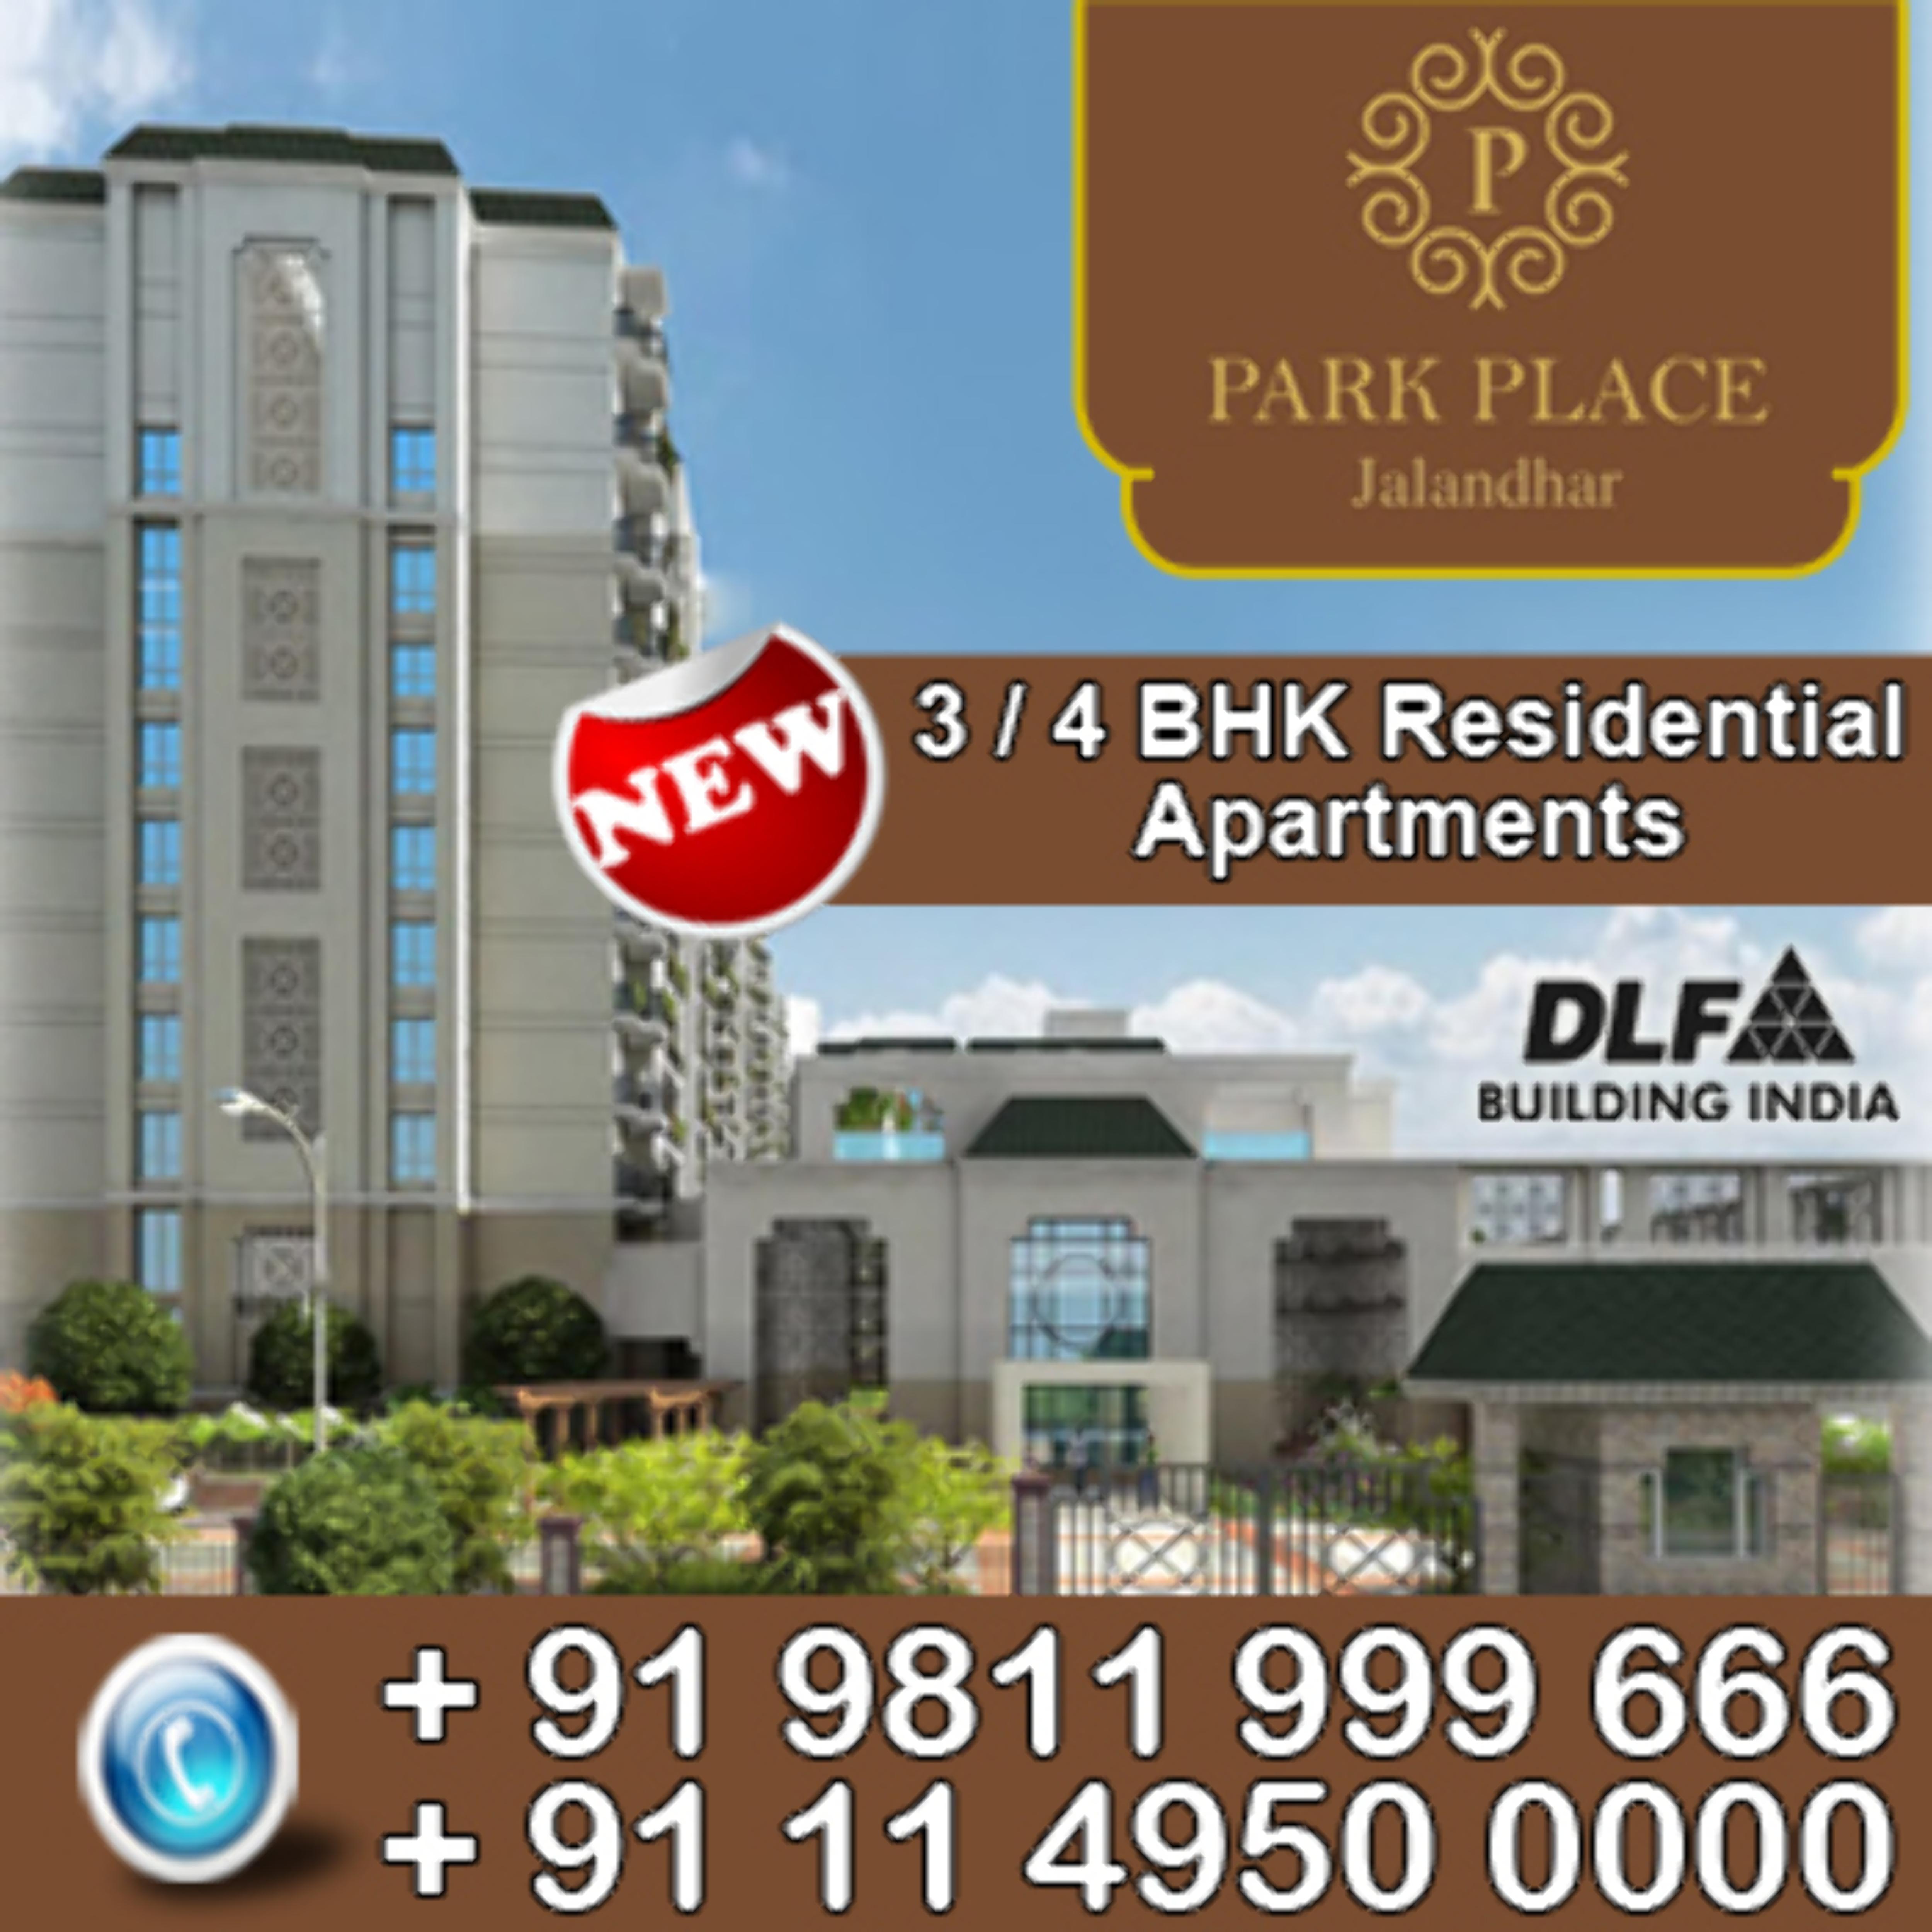 DLF Park Place Jalandhar